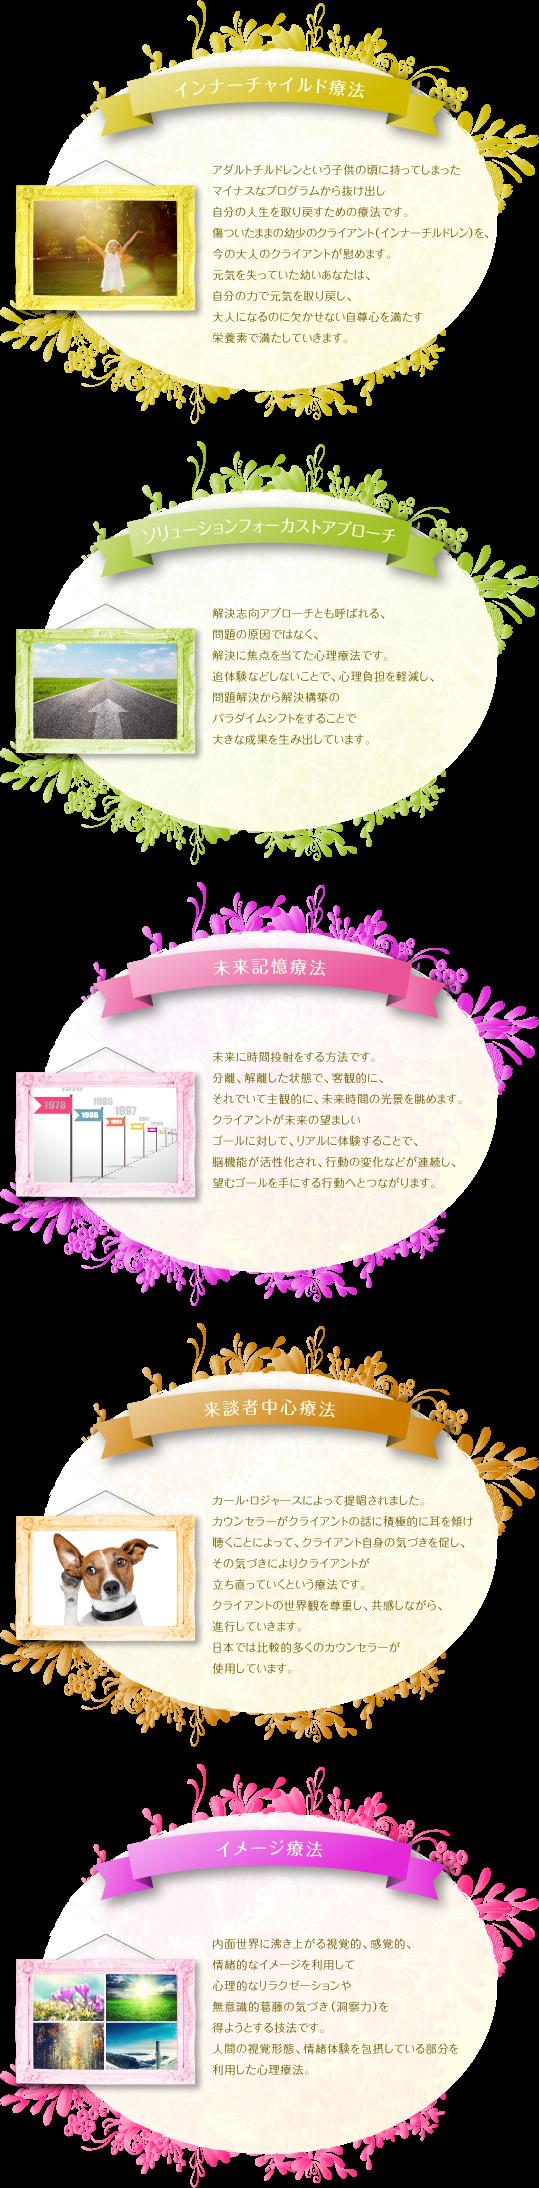 tokyo_setagaya_shimokitszawa_counseling_therapy_coaching340